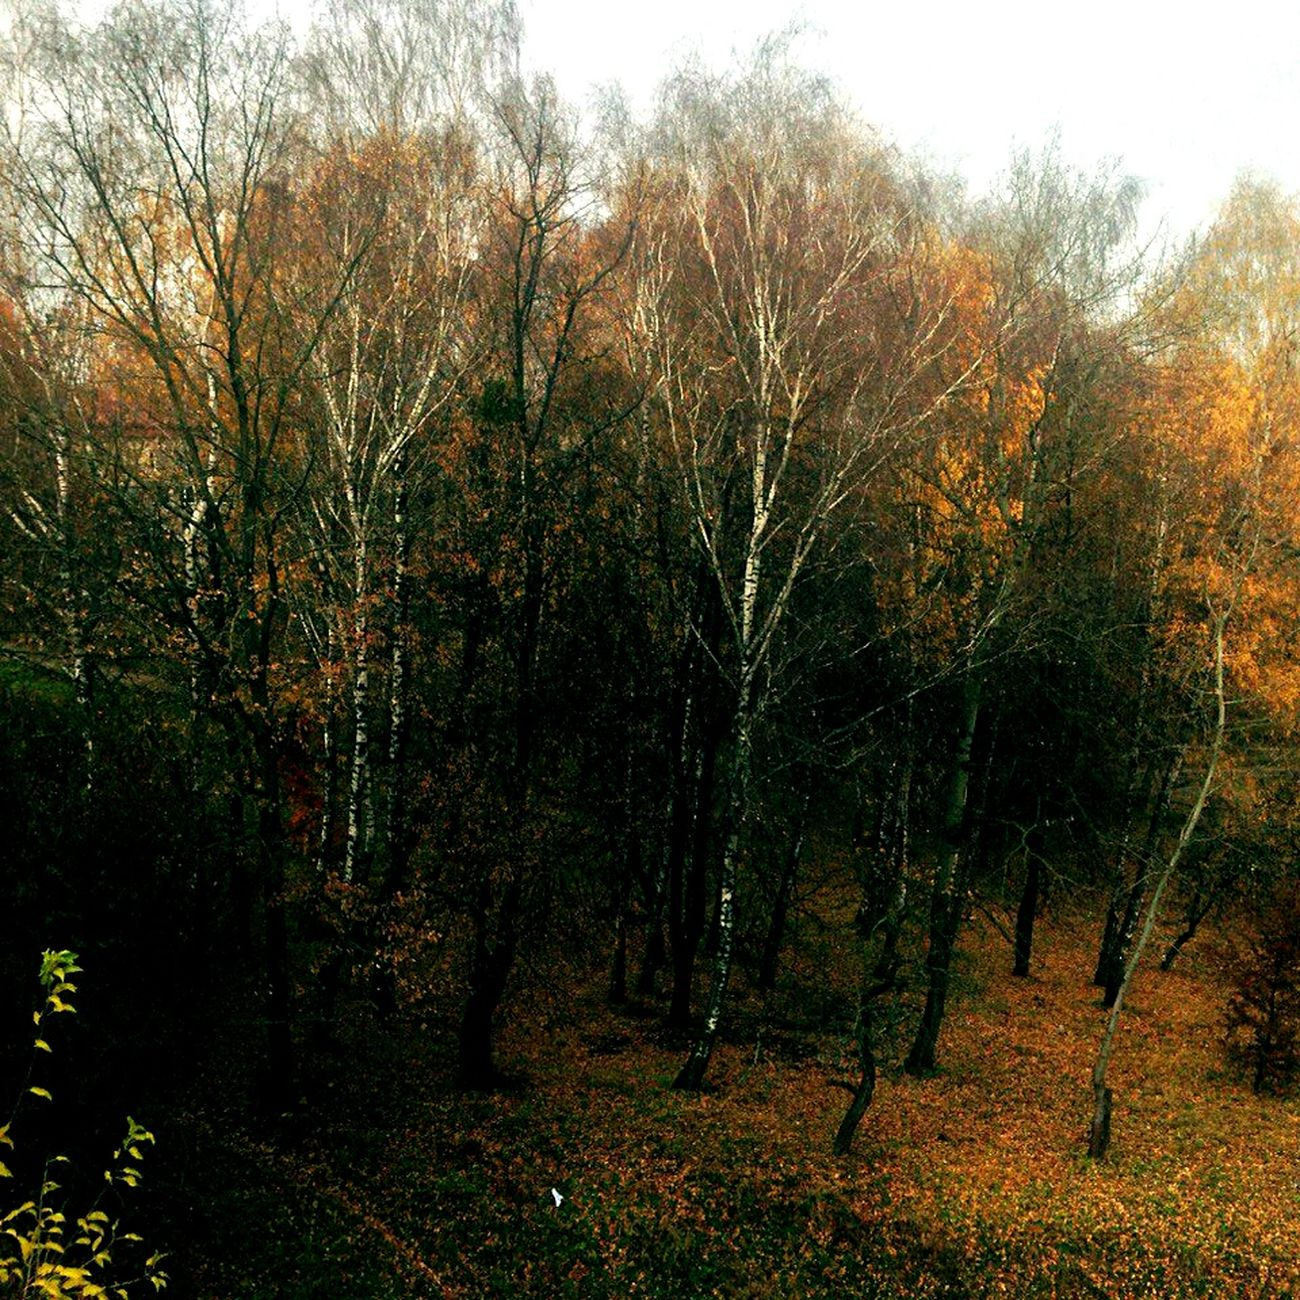 Tree WoodLand Beauty In Nature Nature Outdoors Tree Area Day No People Majestic Lvivgram Lvivforyou Lviv1256 Lvivit Lvivua Old Lviv, Ukraine Vscocam Vscogood Vscogram VSCO Landscape Autumn🍁🍁🍁 Autumn Colors